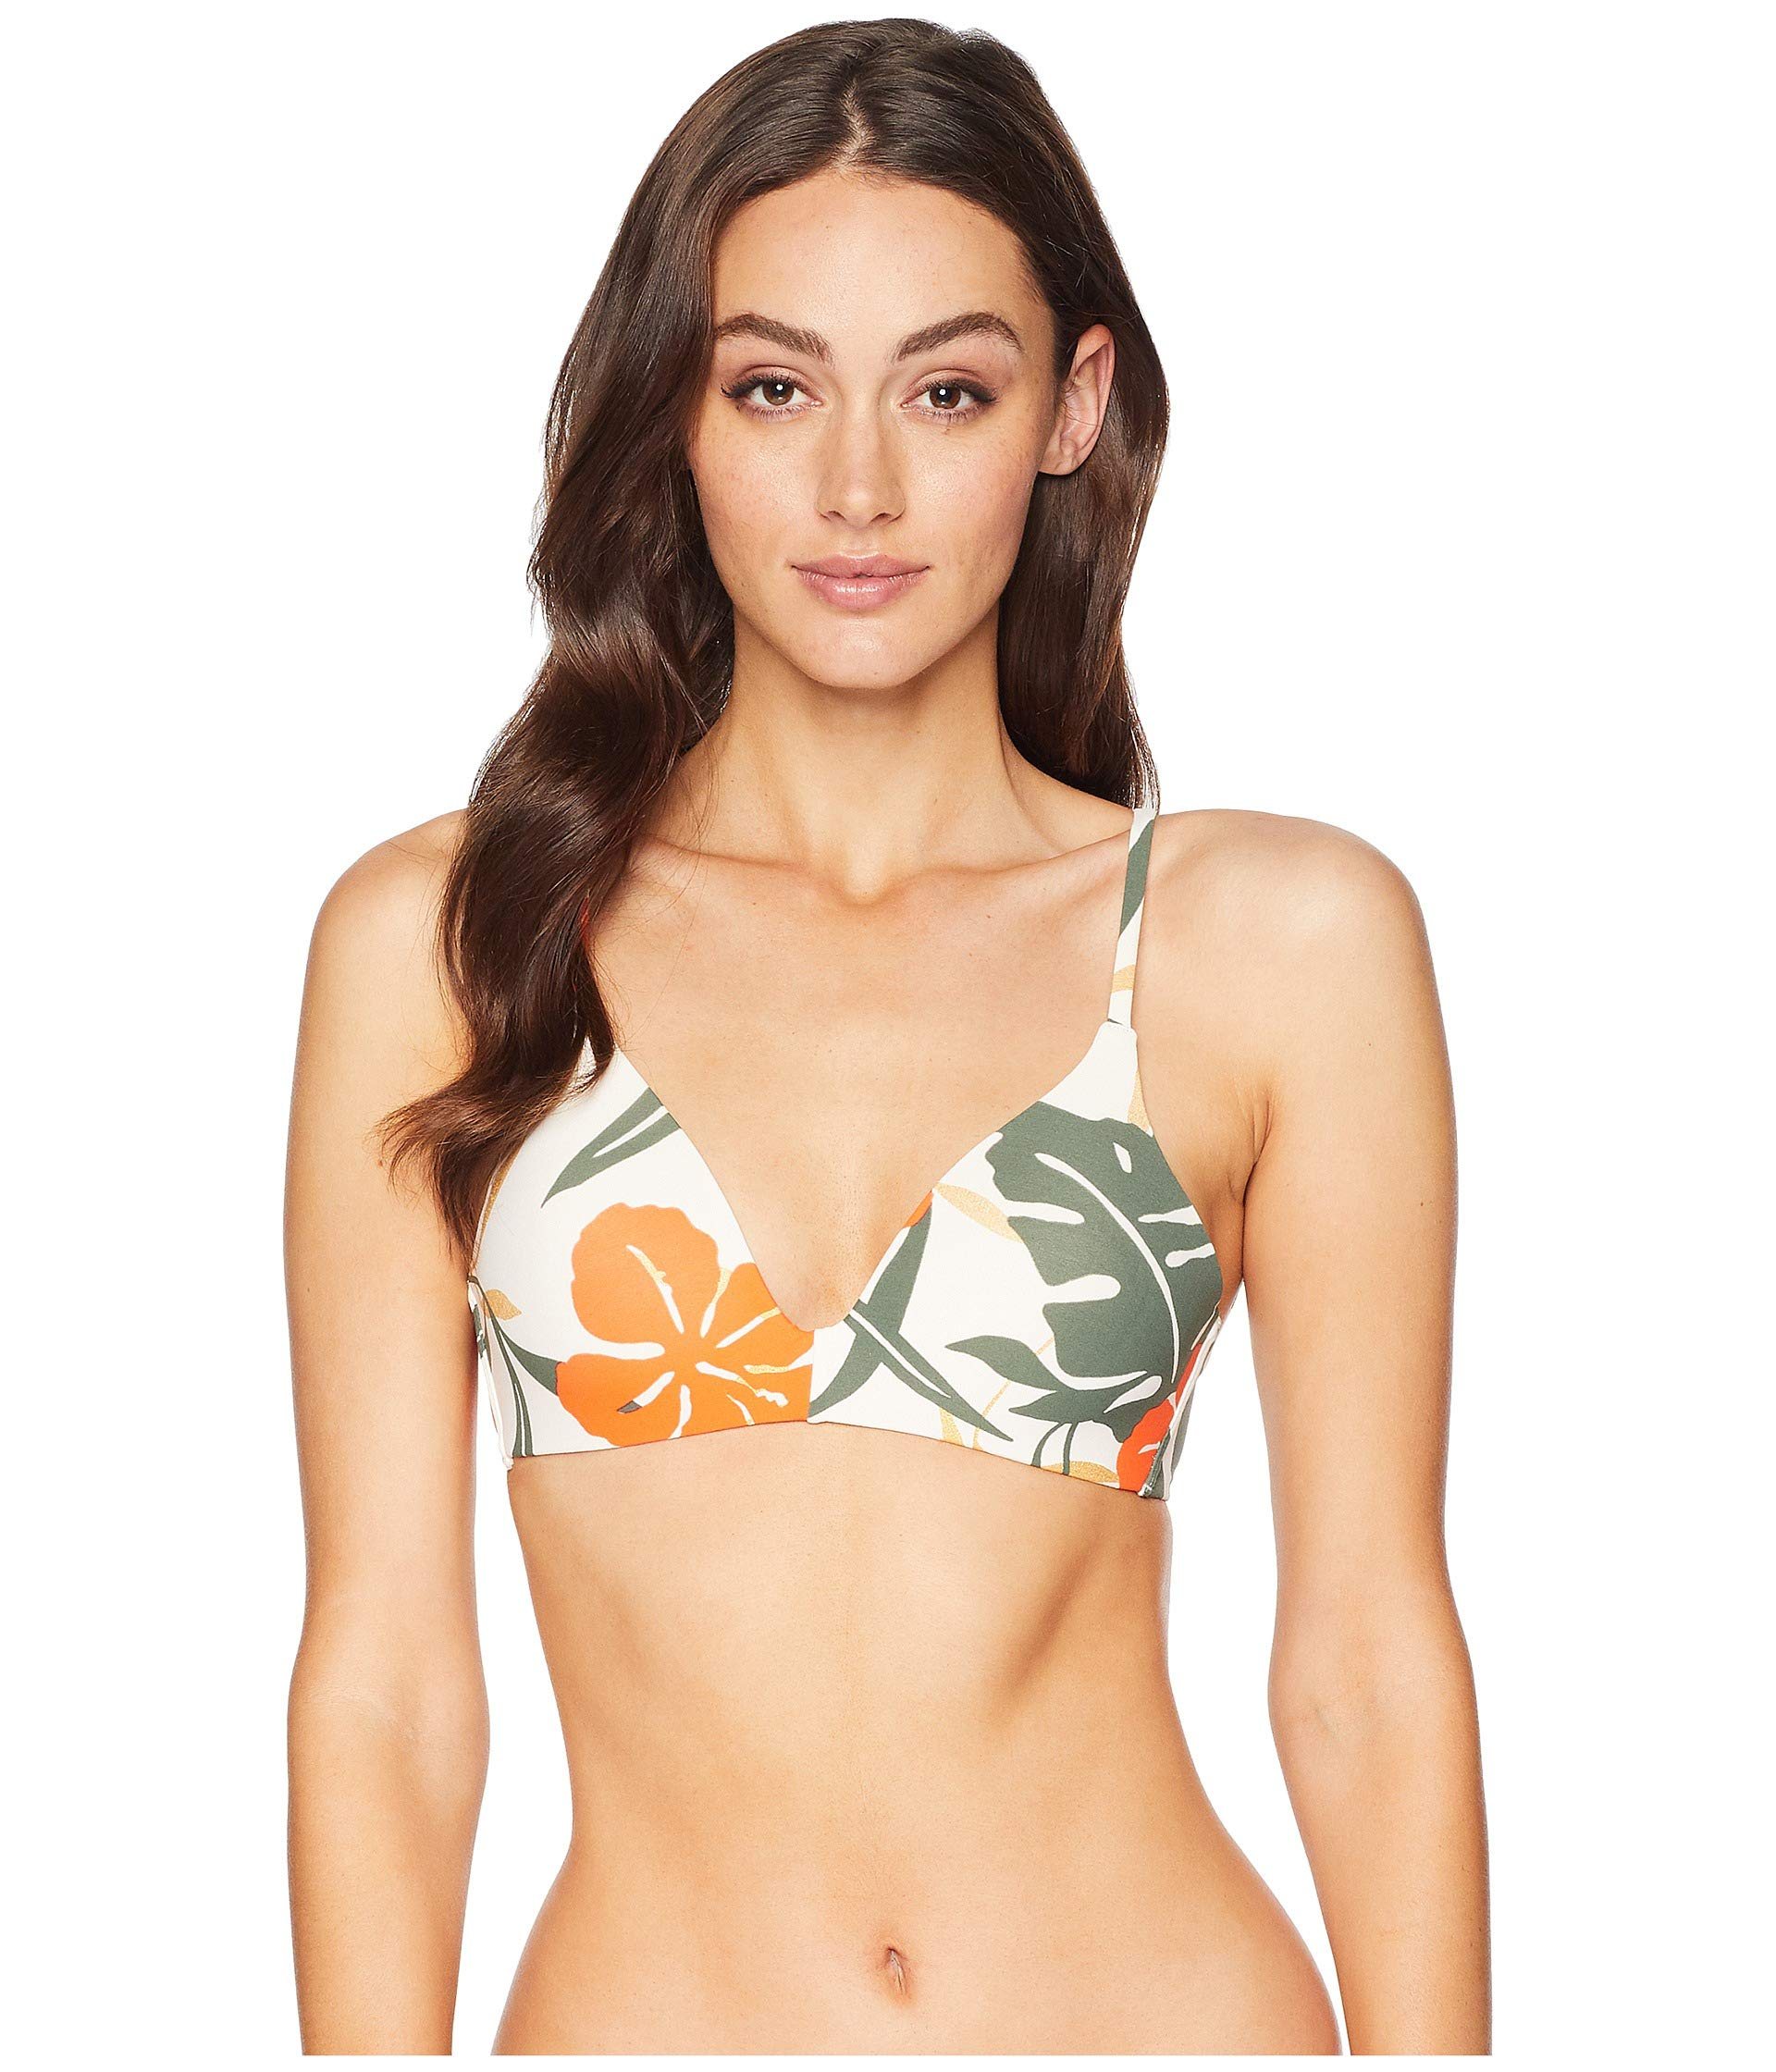 Bloom Bikini Shell Camuto Molded Vince Top Tropical wBEZxqO